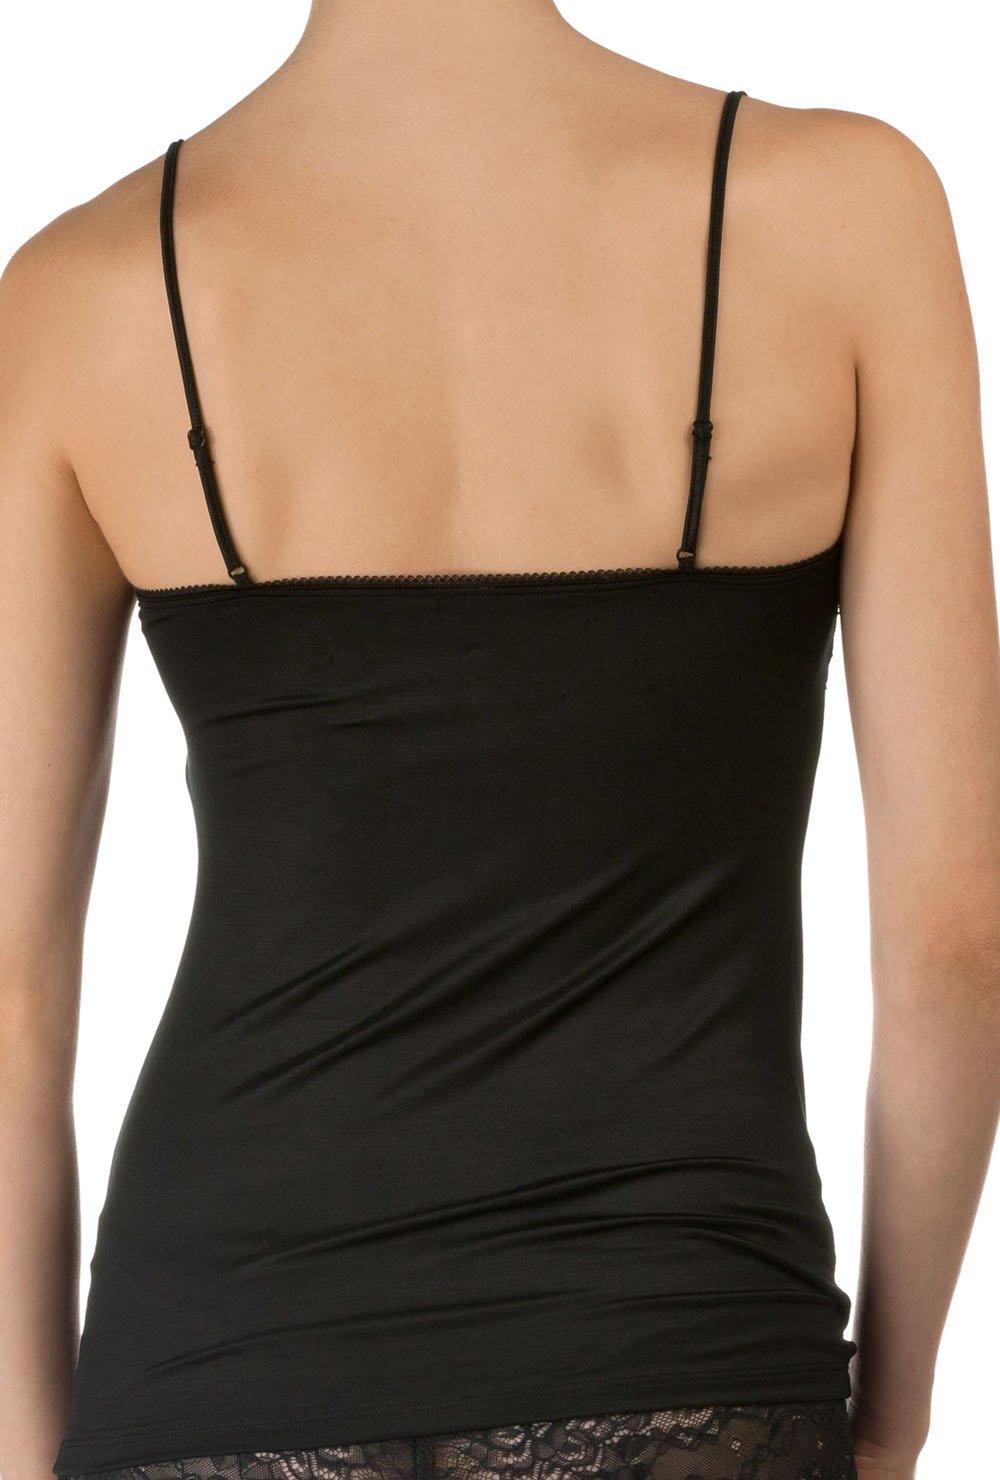 Calida Damen Unterhemd Spaghetti-Top-Sweet Secrets: Amazon.de: Bekleidung